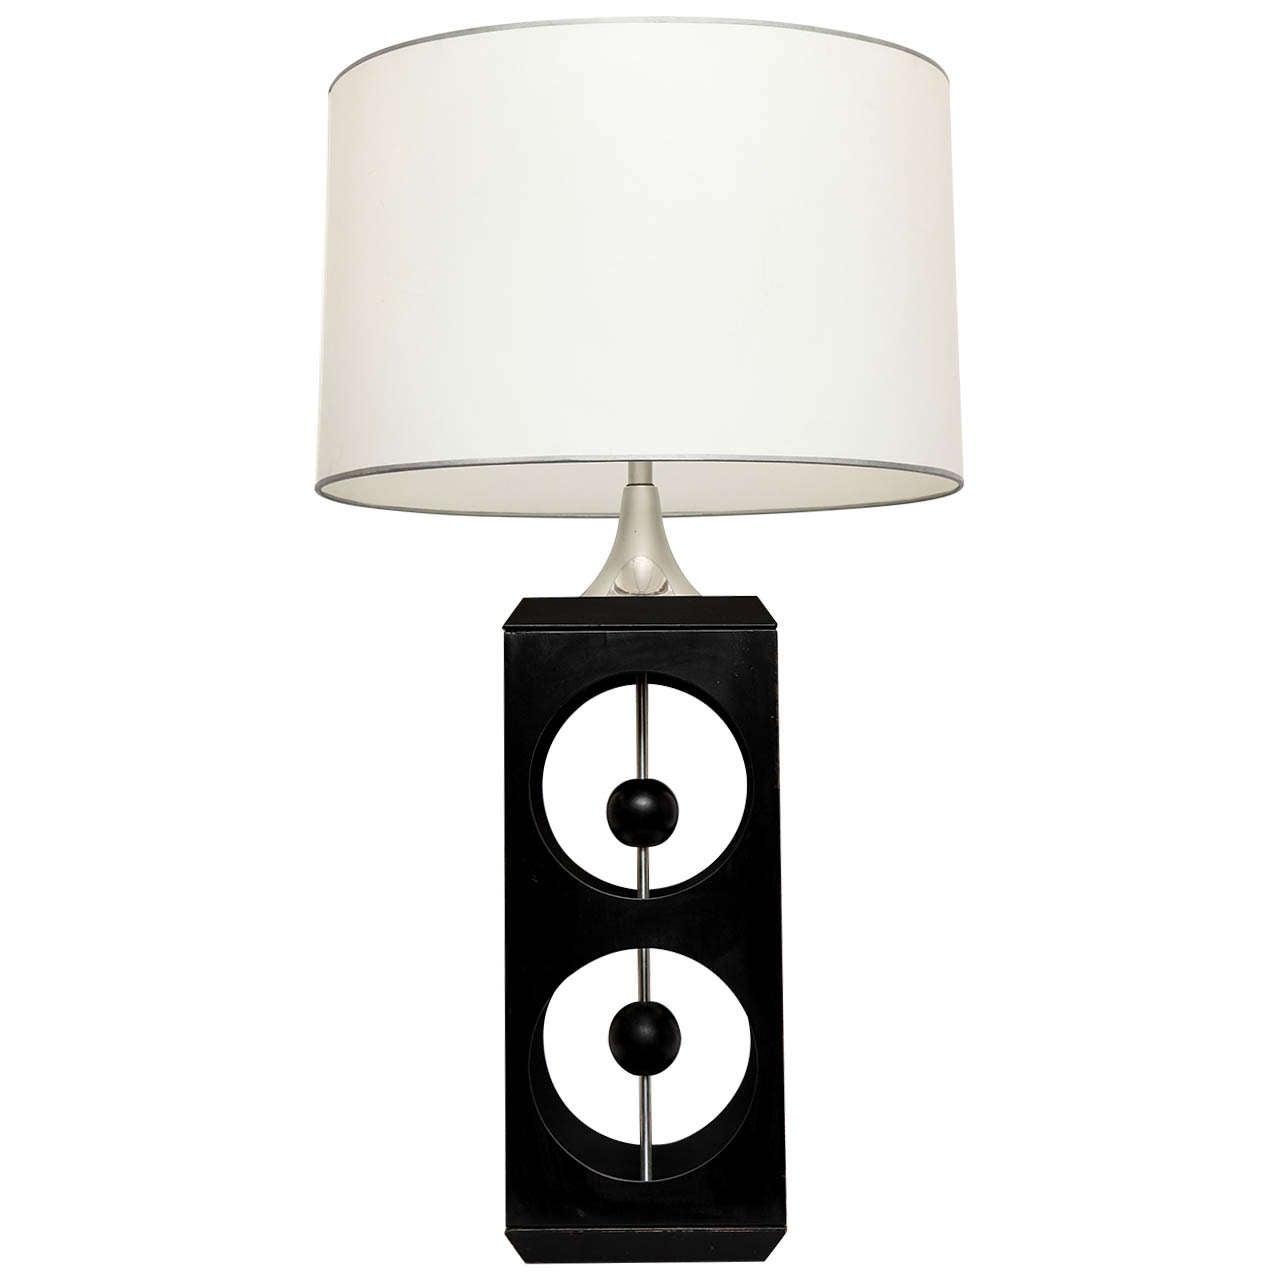 1960s Modernist Table Lamp Signed Modeline